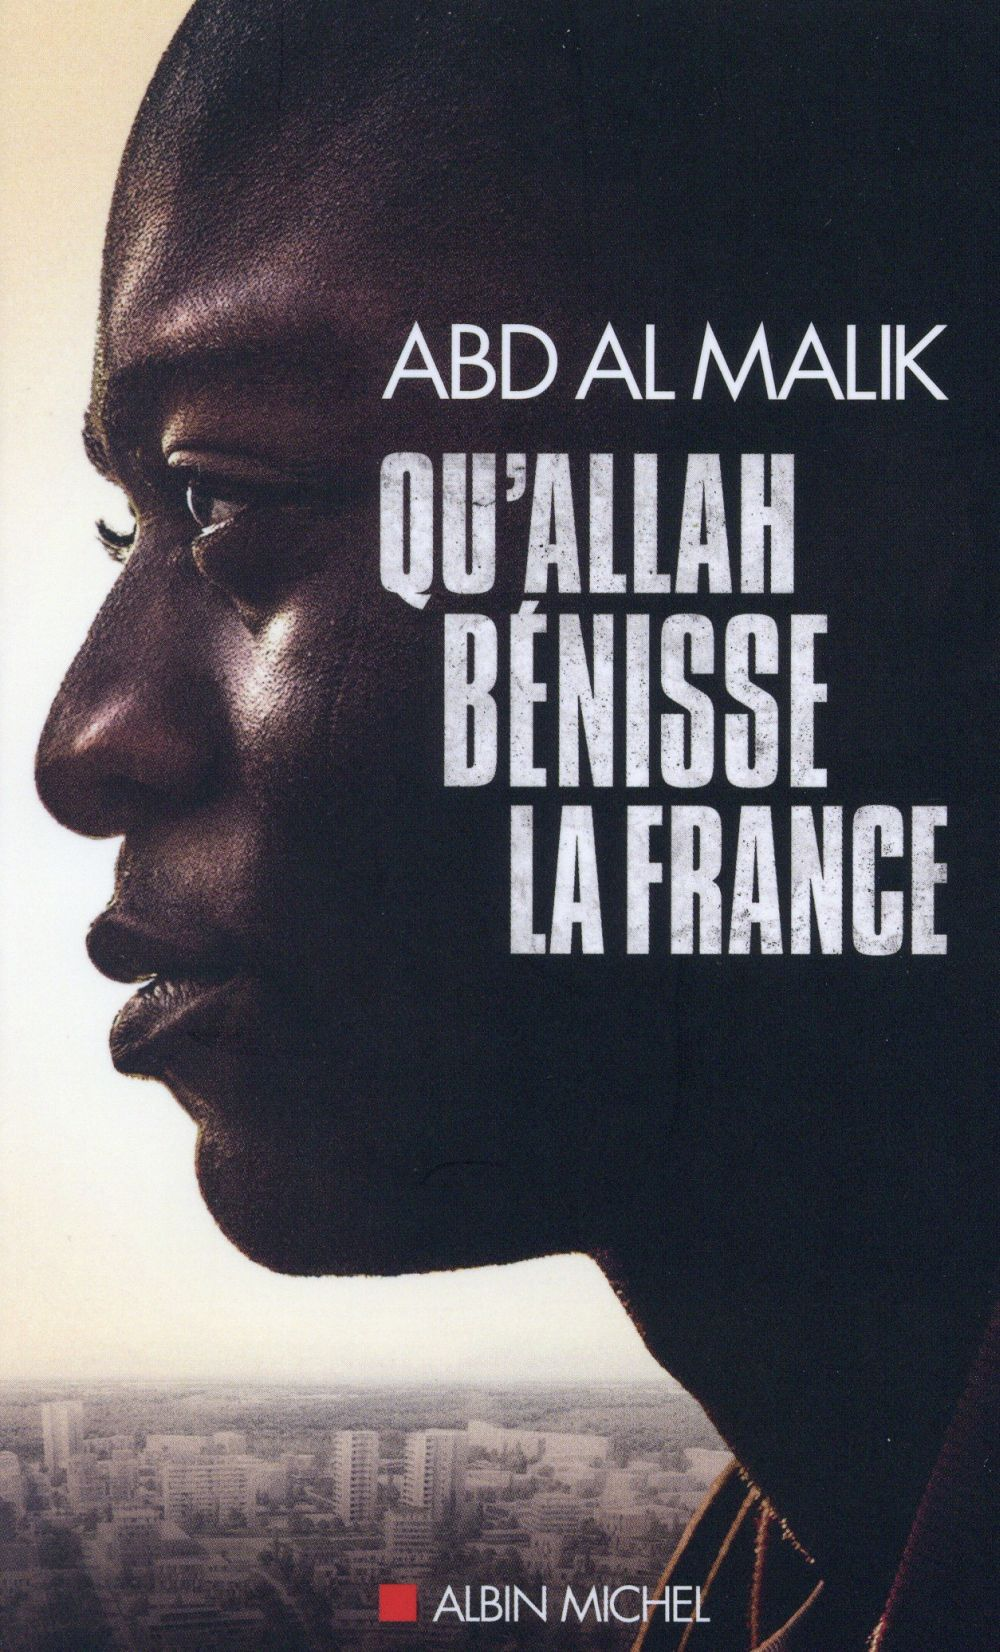 QU'ALLAH BENISSE LA FRANCE !